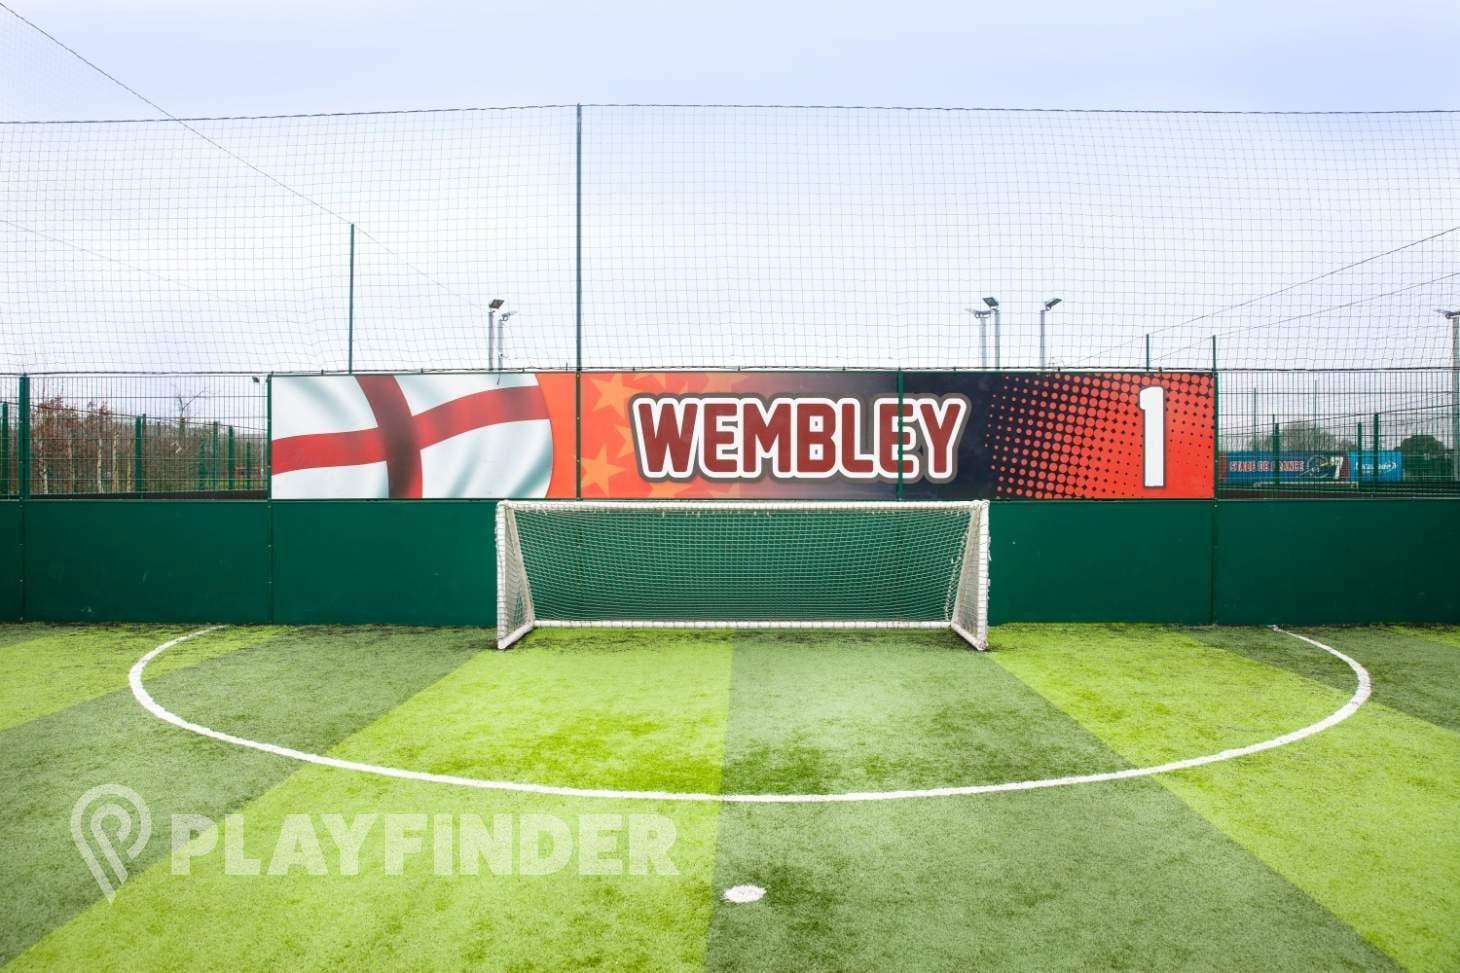 Goals Birmingham Perry Barr 5 a side | 3G Astroturf football pitch